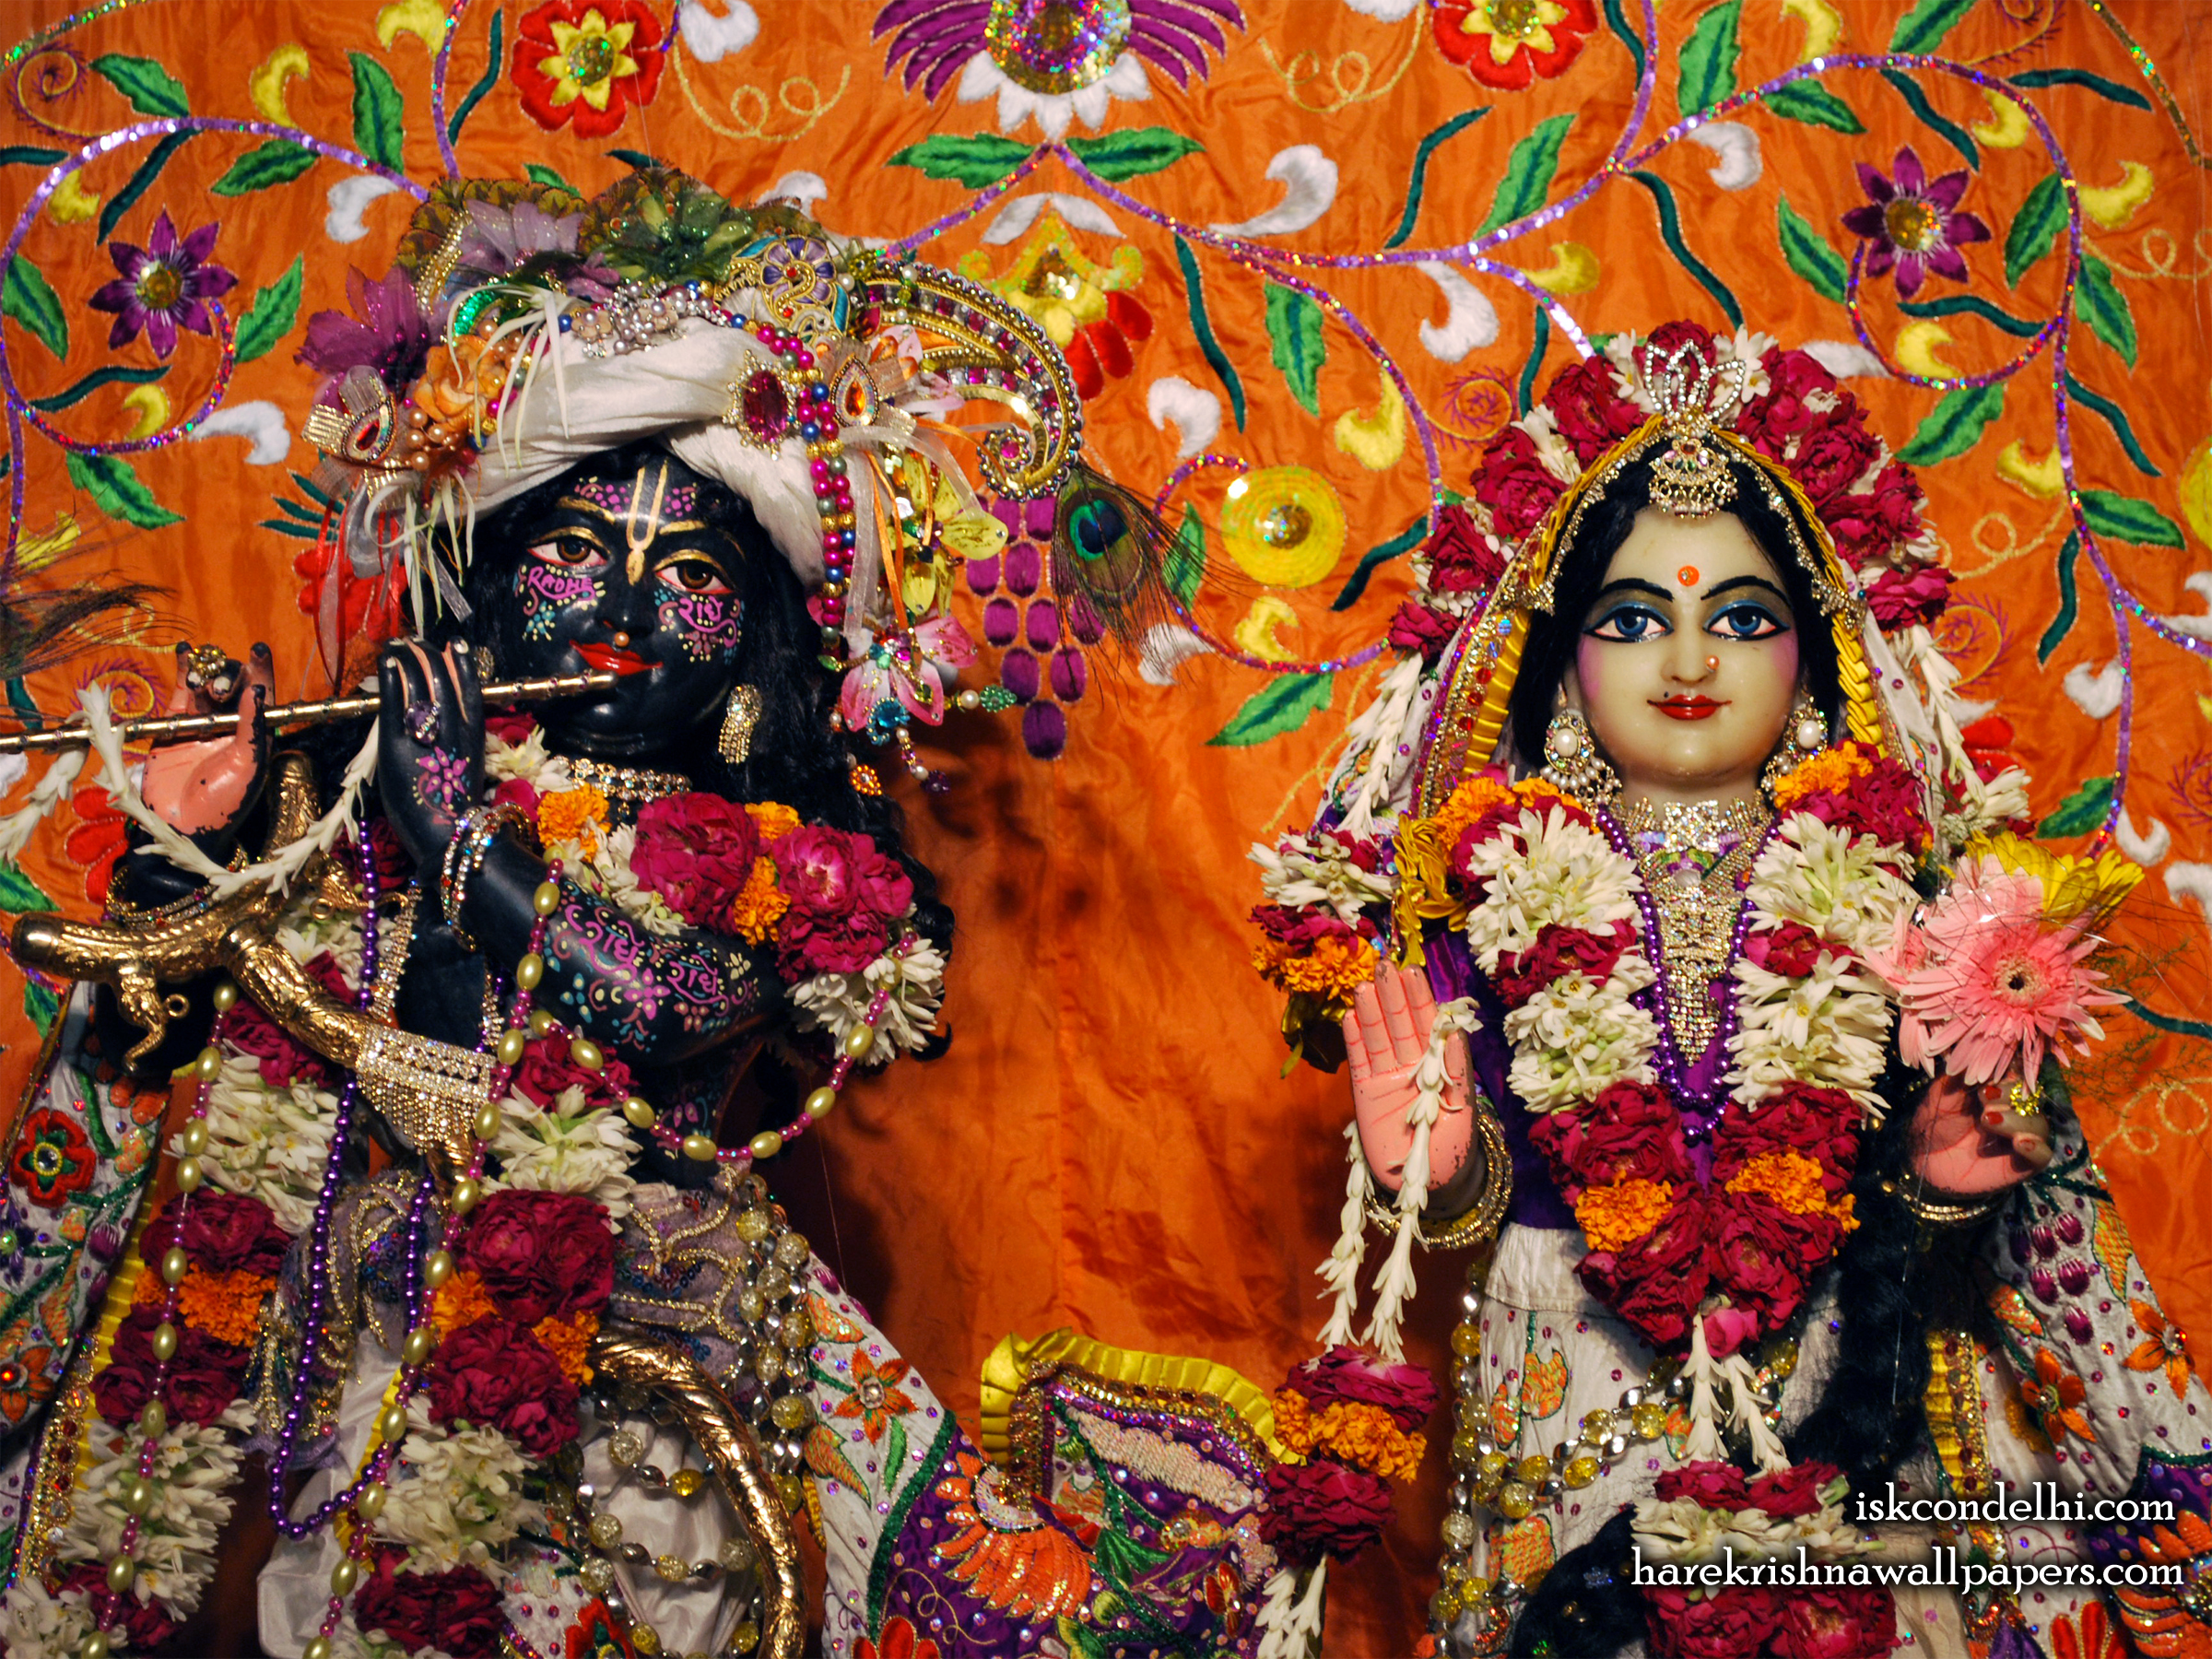 Sri Sri Radha Parthasarathi Close up Wallpaper (012) Size 2400x1800 Download